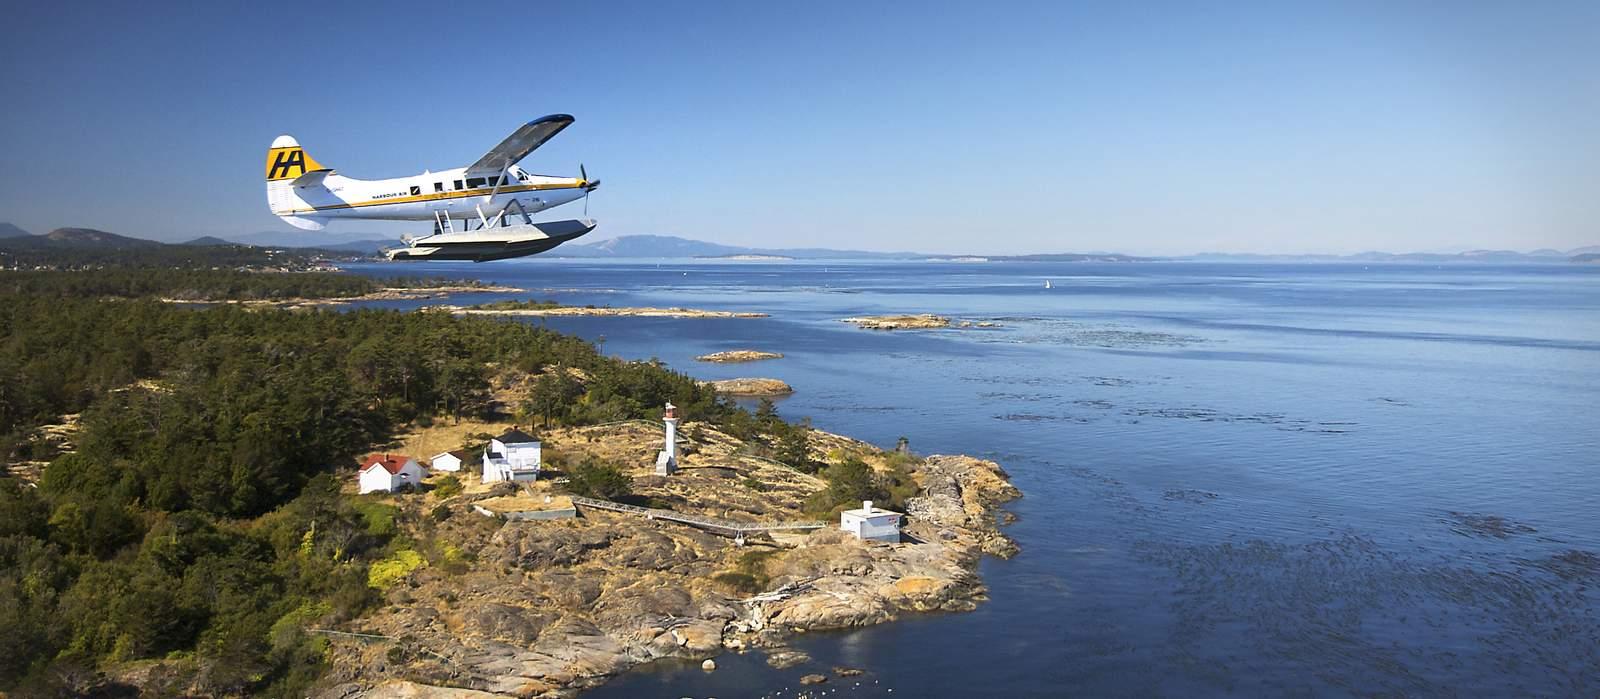 Impression Harbour Air Seaplanes